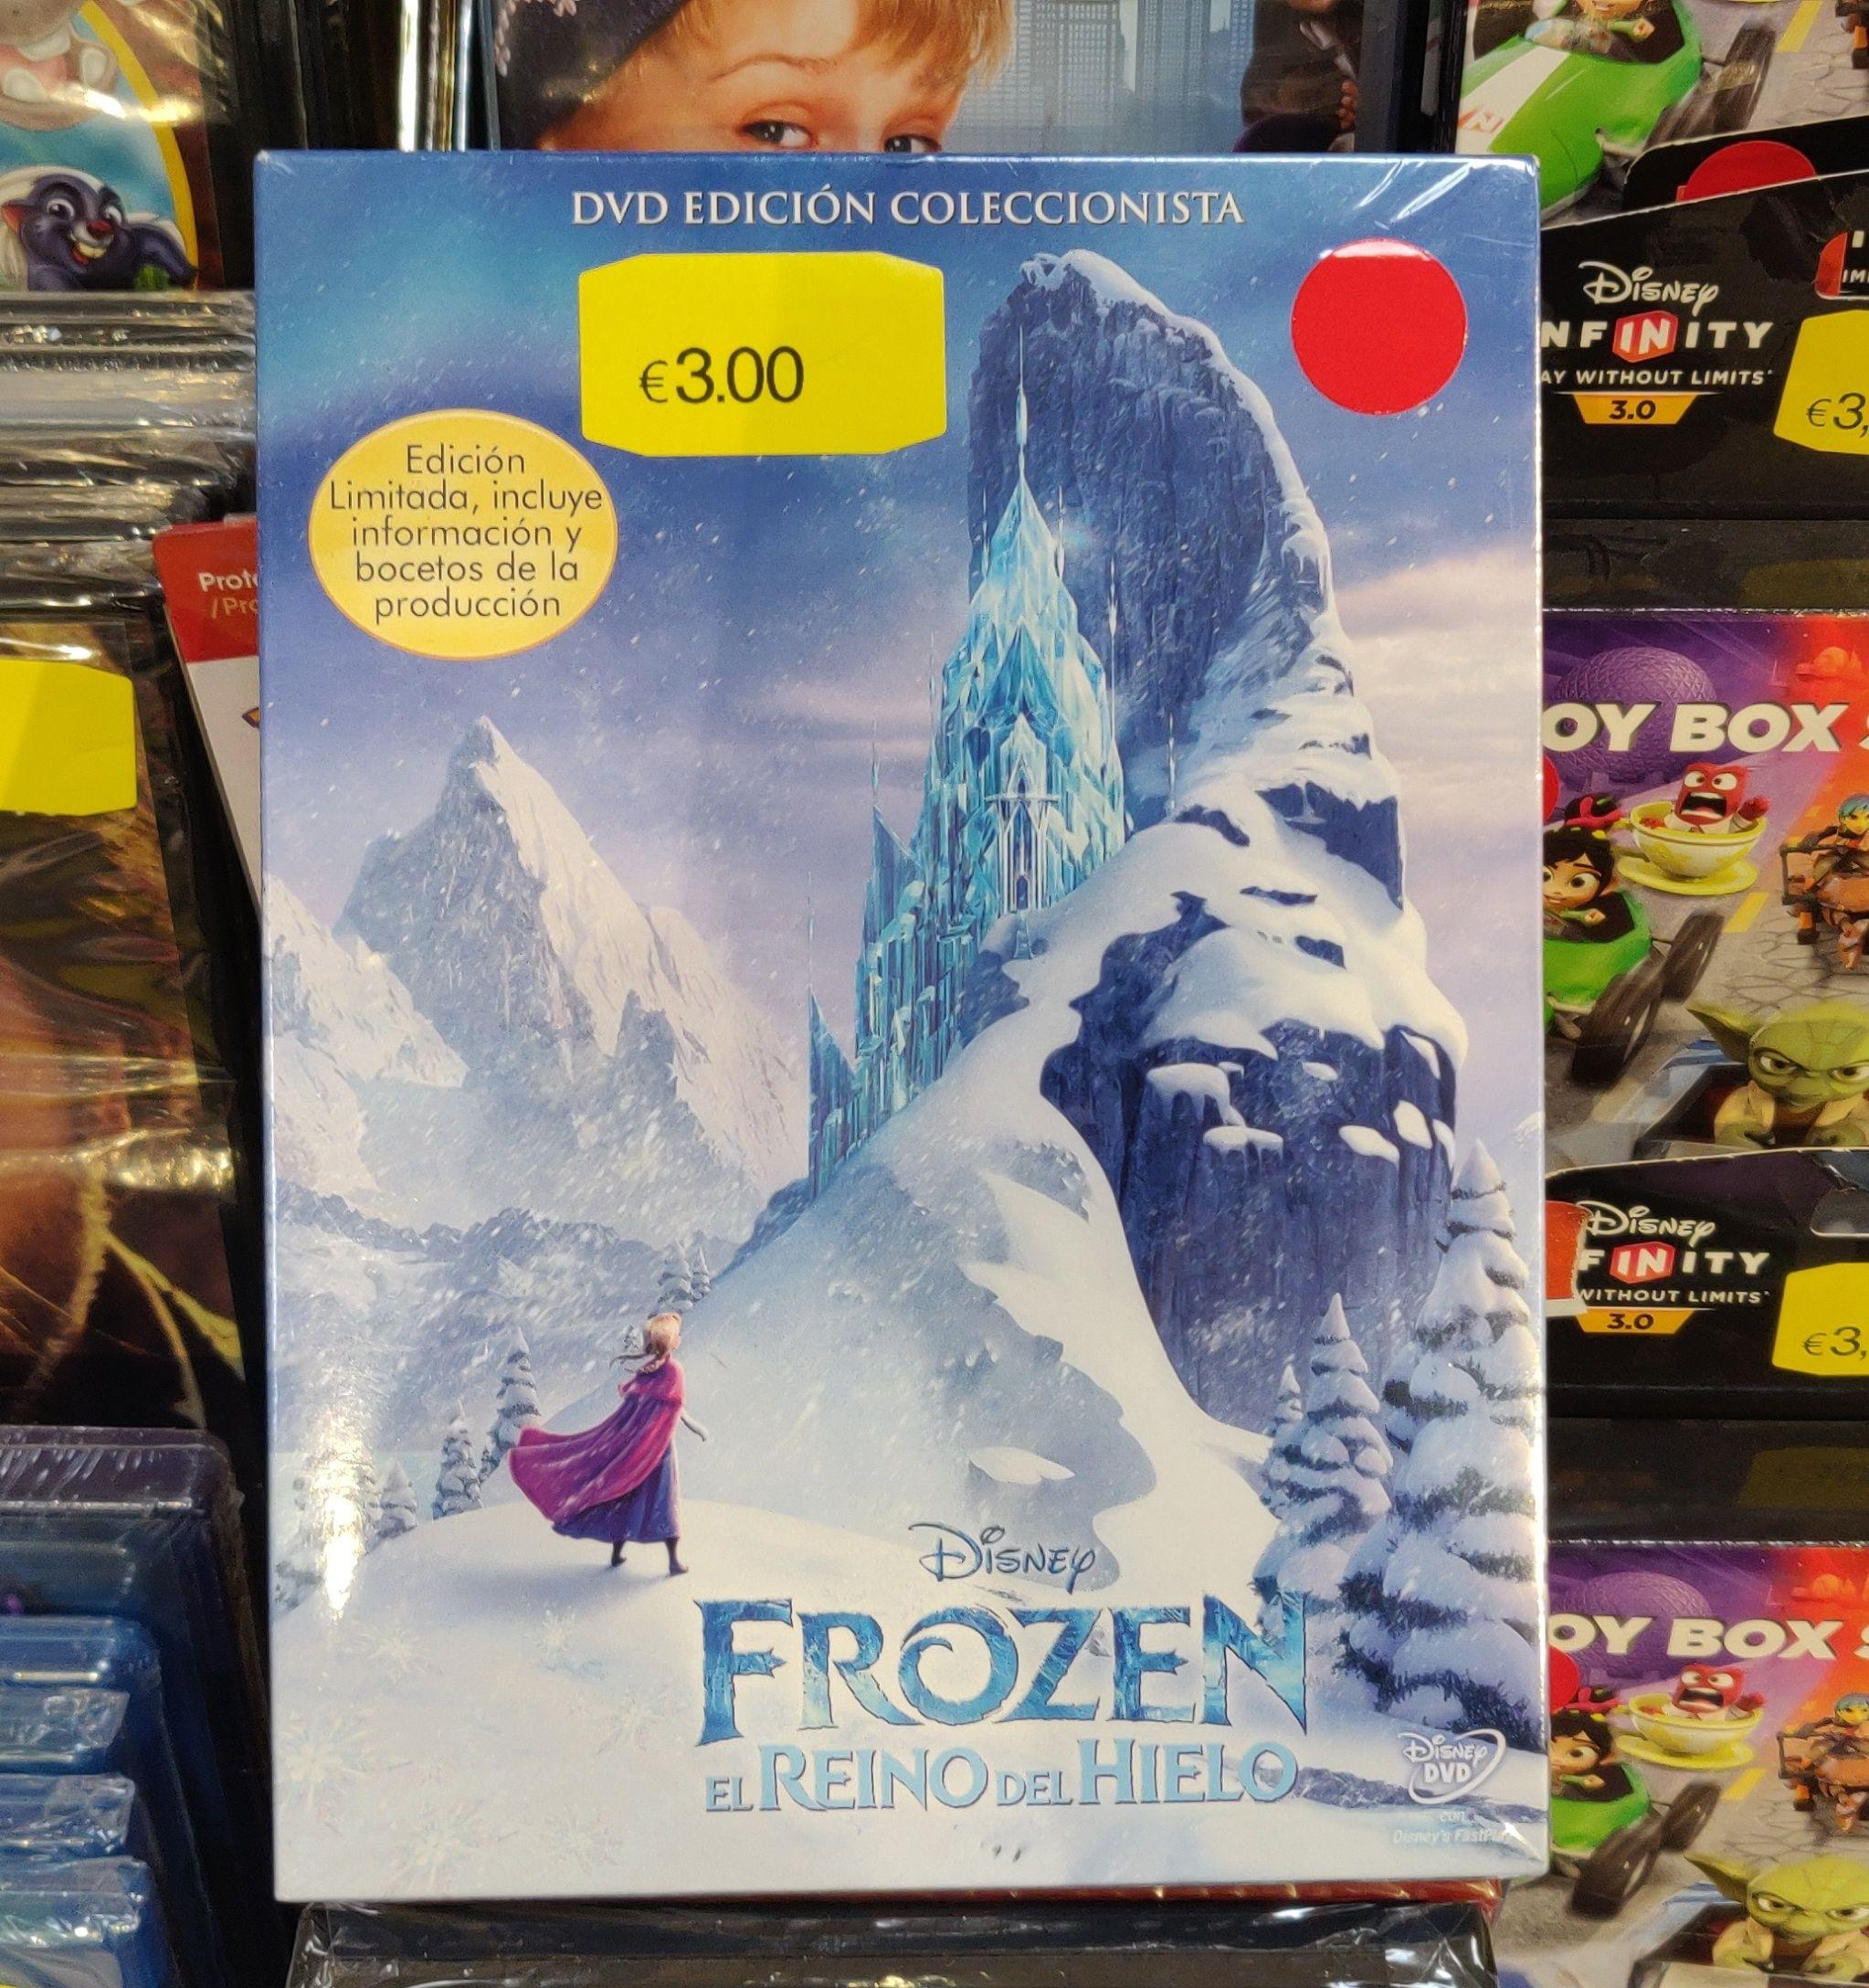 Frozen (Edición Coleccionista DVD)